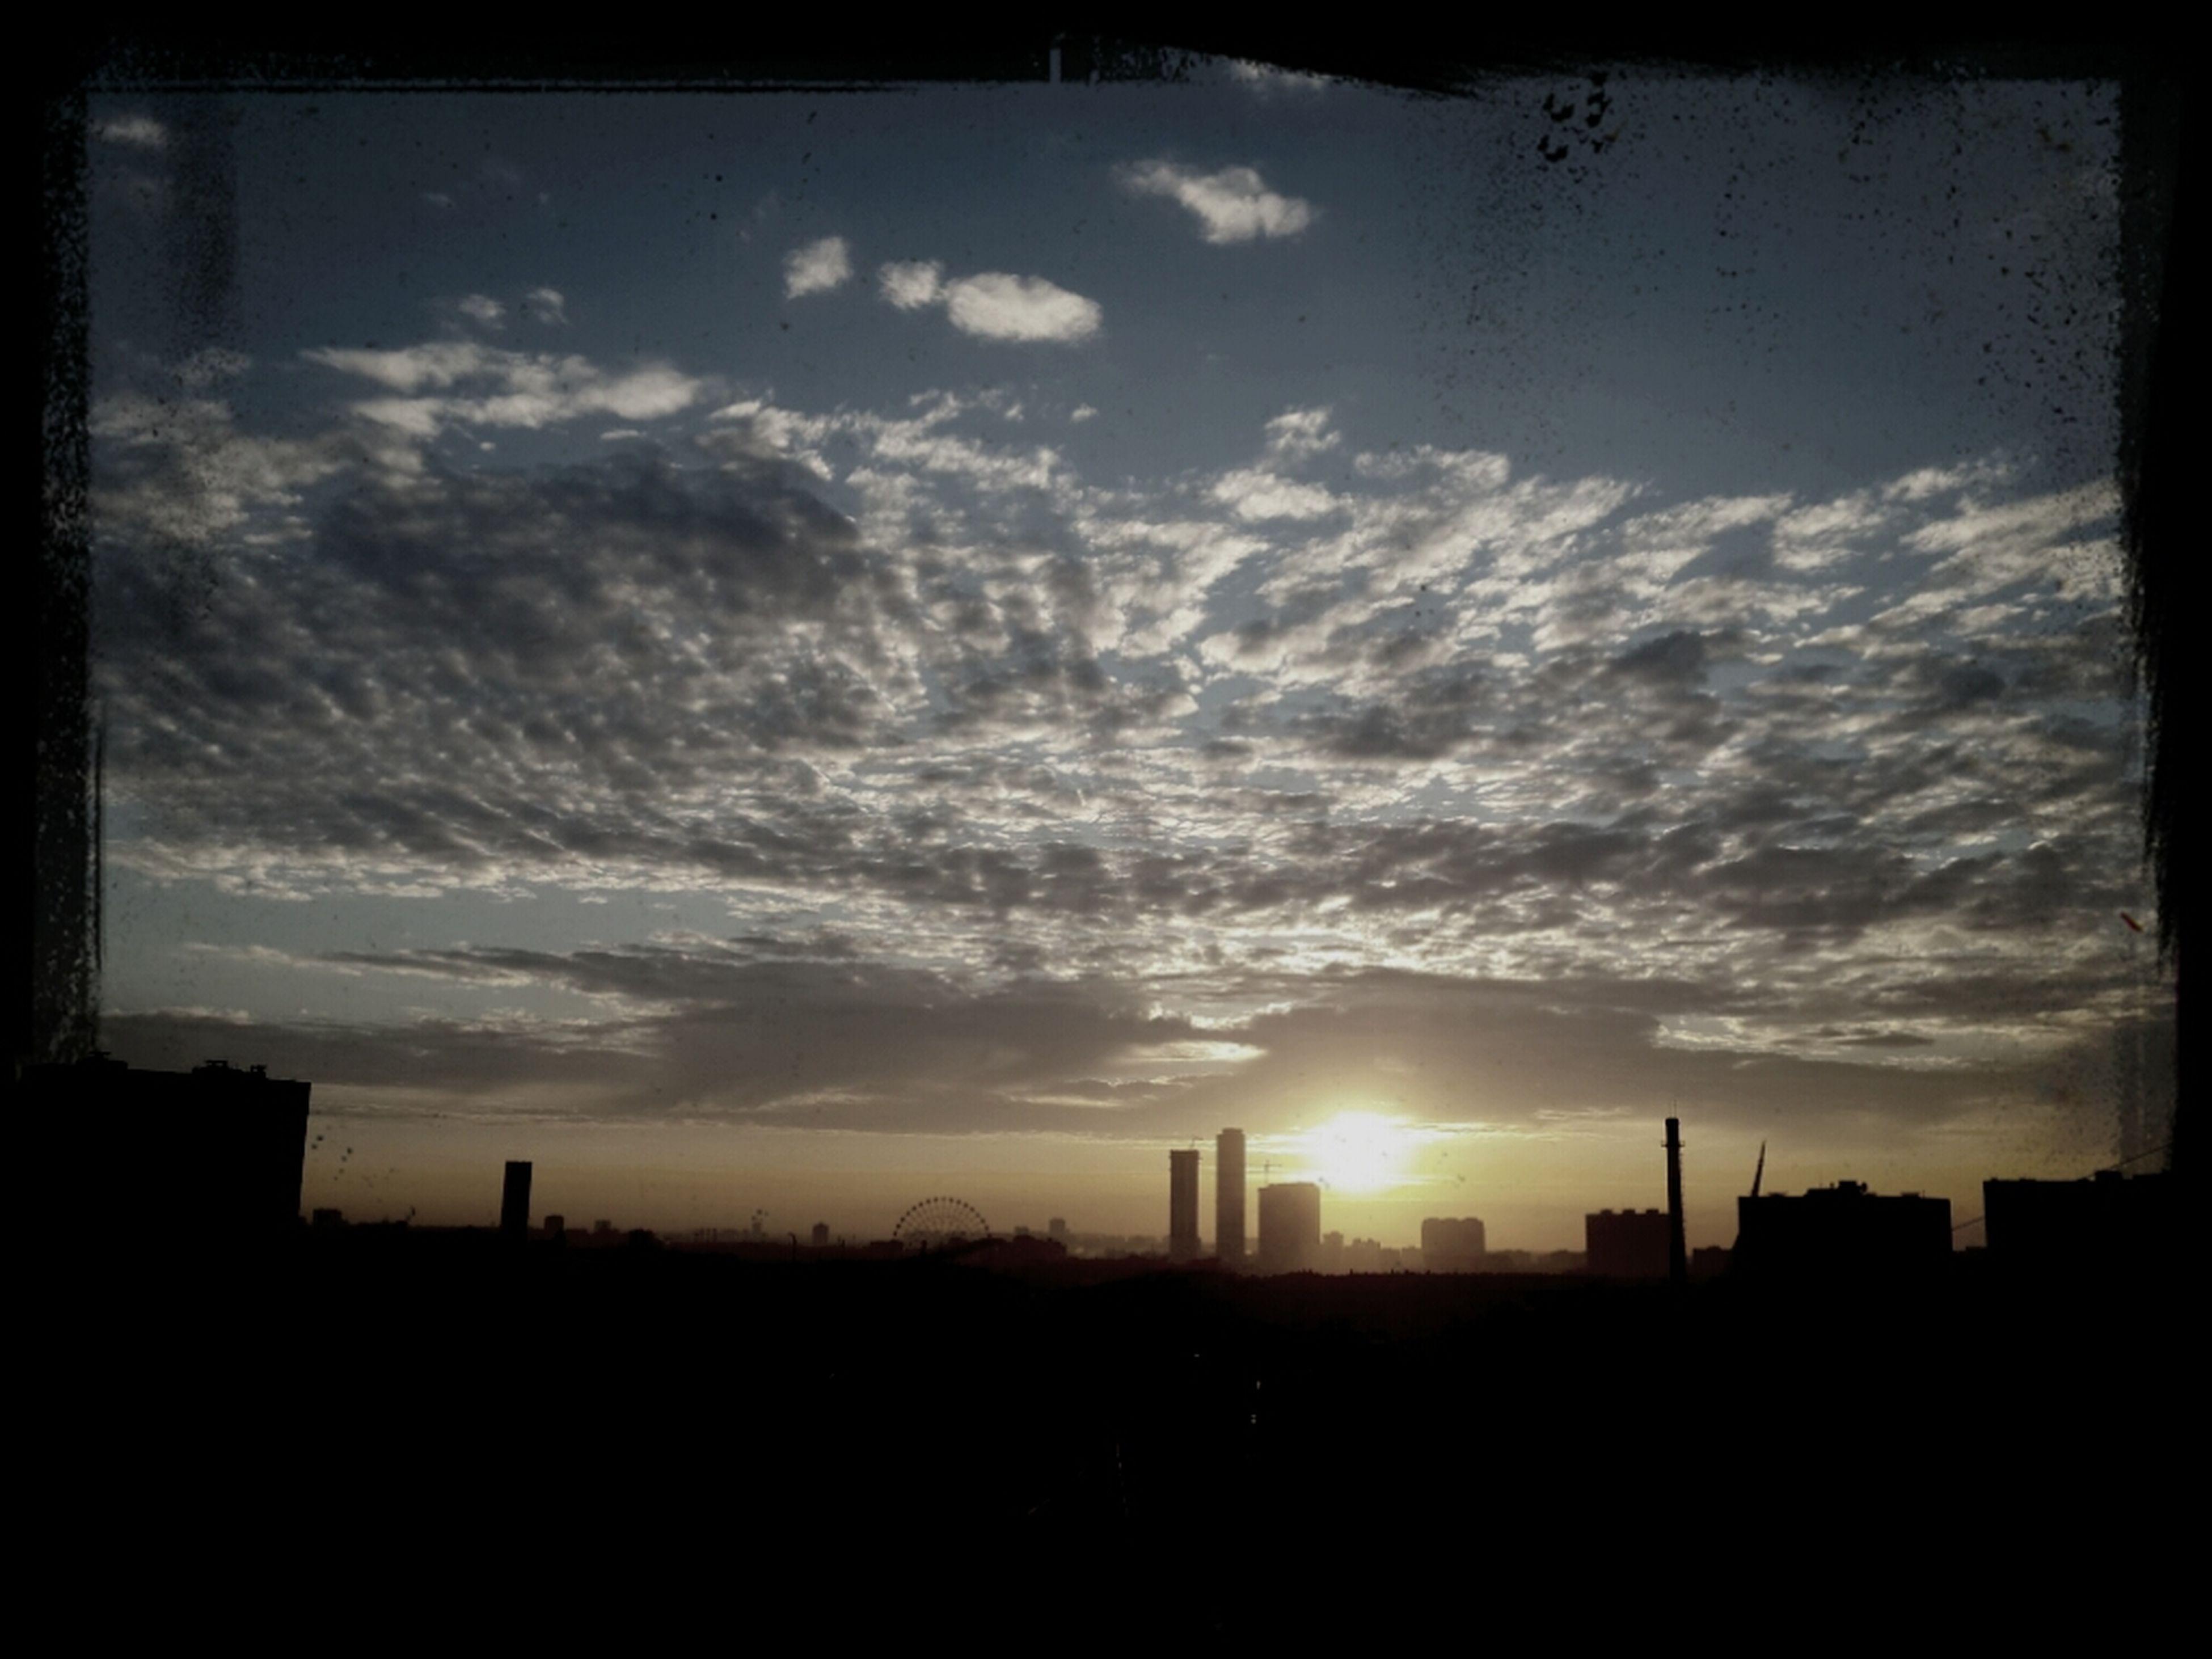 silhouette, sunset, building exterior, sky, architecture, built structure, cloud - sky, city, cloudy, cityscape, cloud, sun, dark, beauty in nature, scenics, urban skyline, nature, outdoors, sunlight, no people